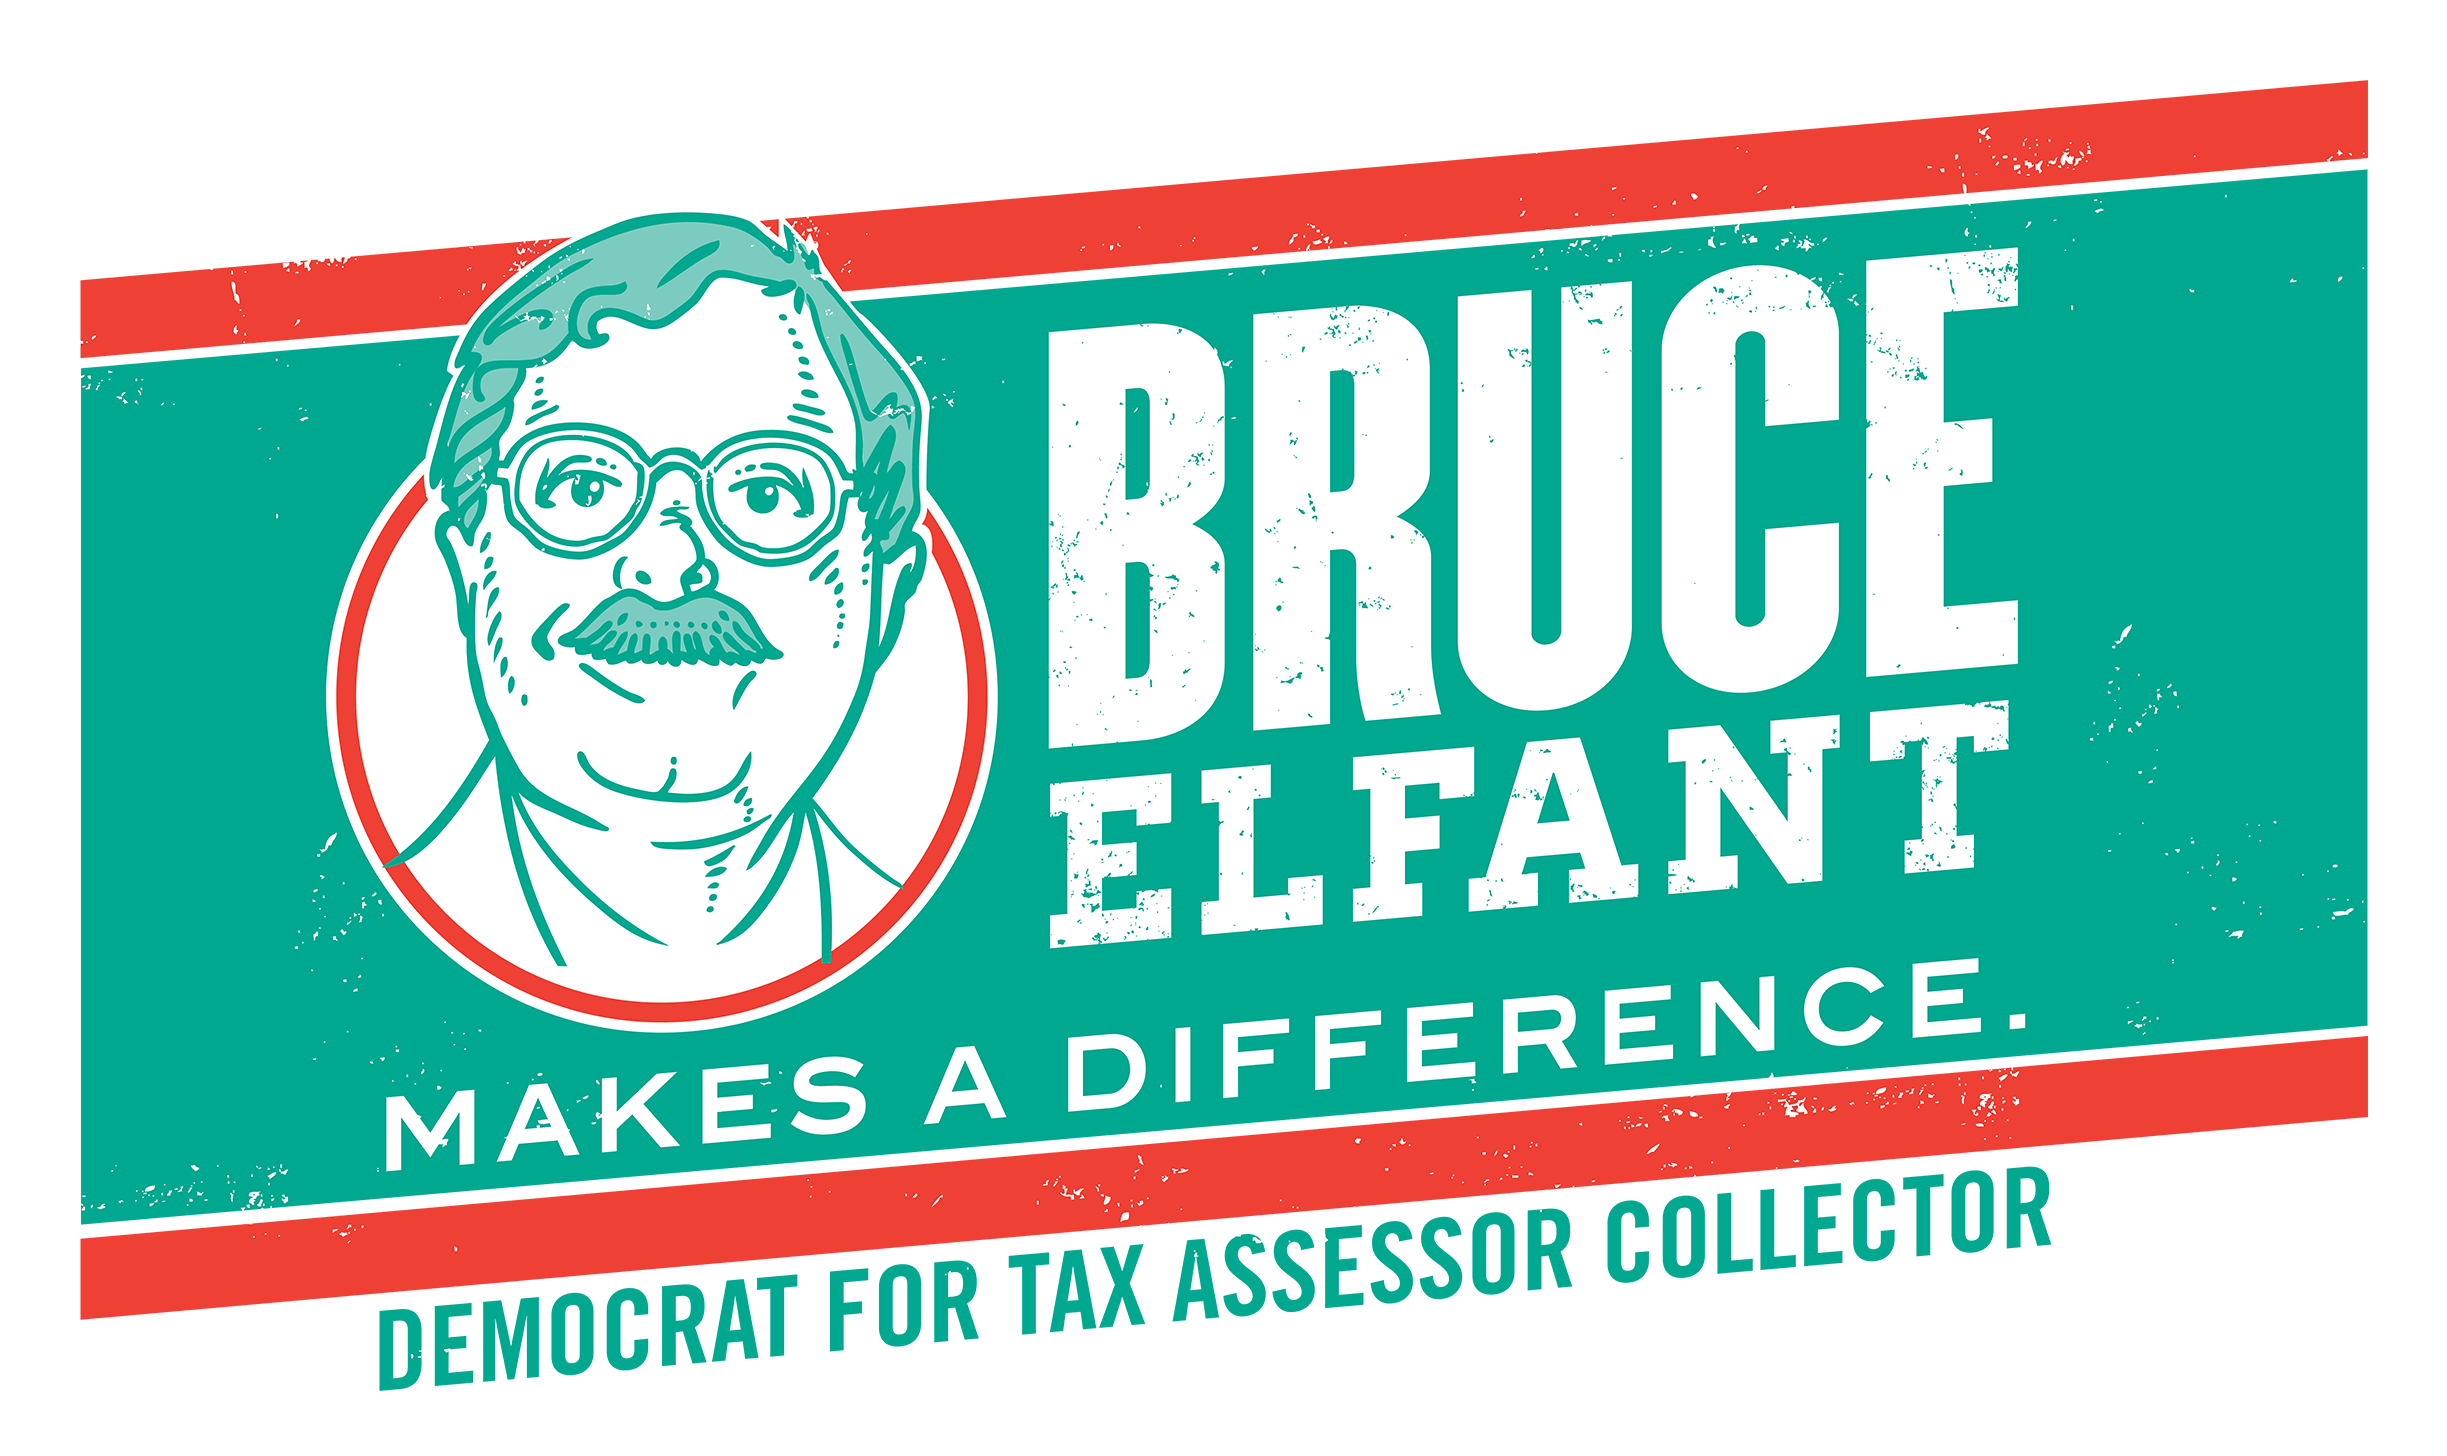 Bruce Elfant Democrat for tax assessor collector